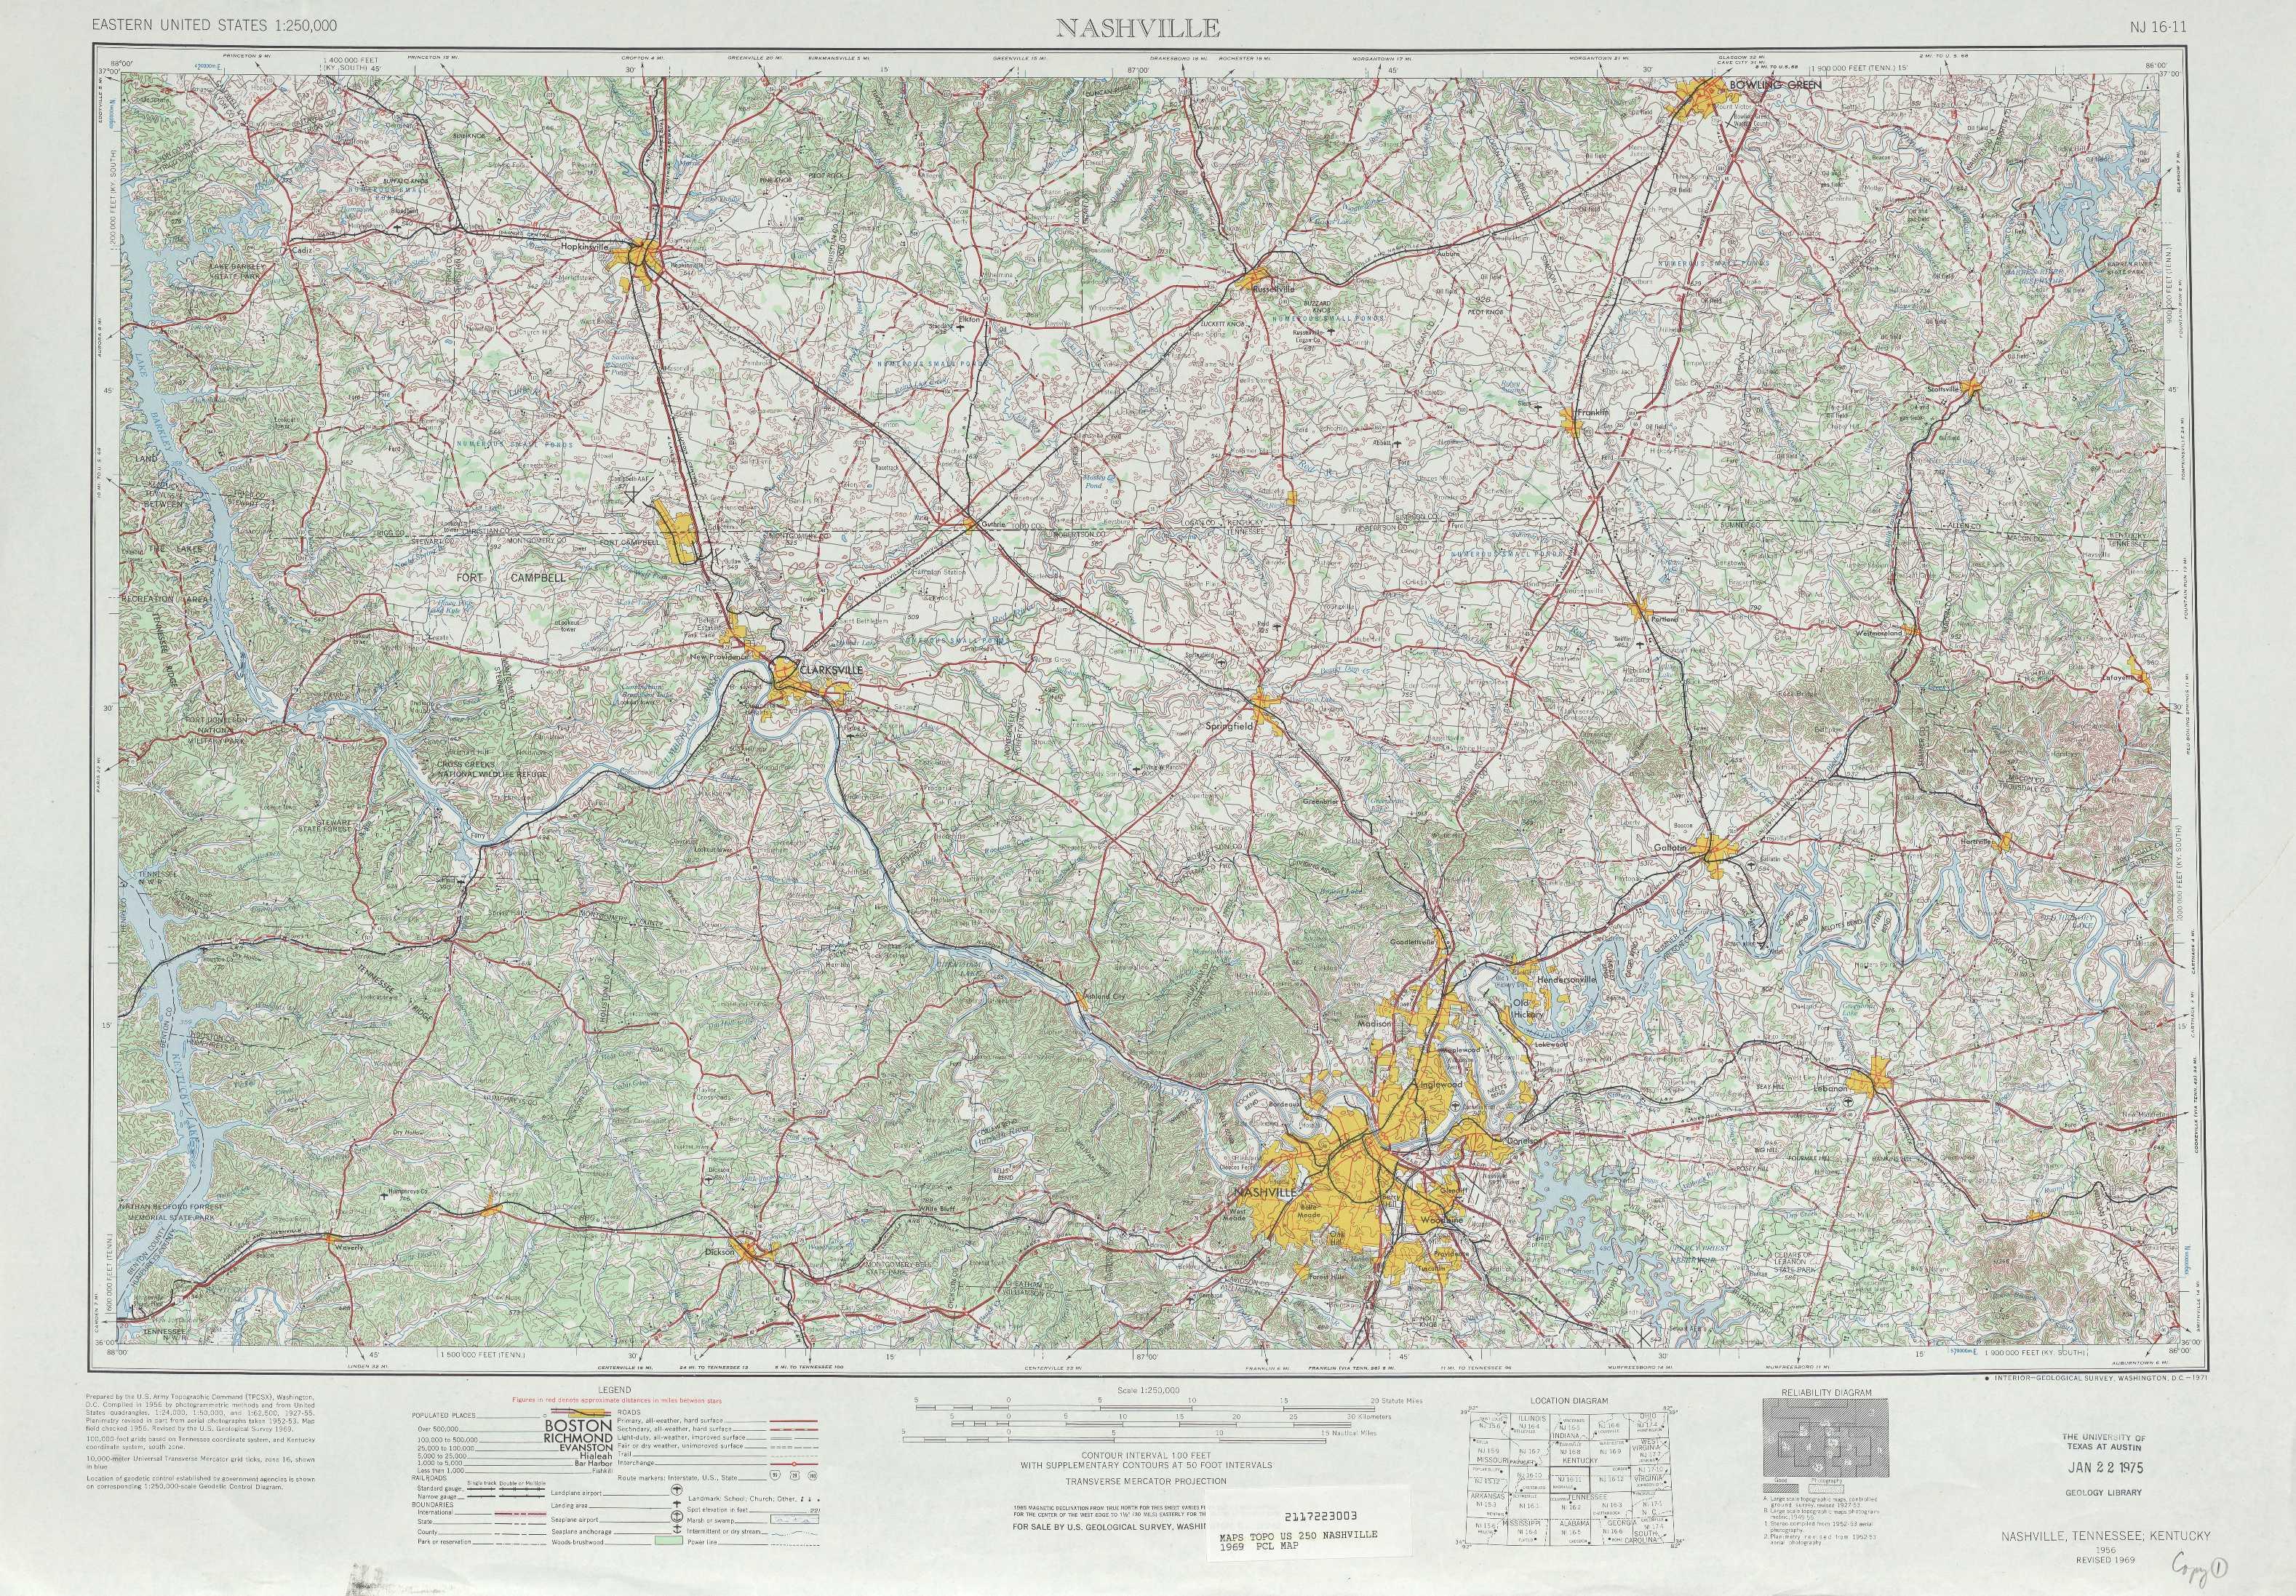 Nashville topographic maps, TN, KY - USGS Topo Quad 36086a1 ... on north carolina map, usa map, tn map, ohio map, illinois map, virgina map, mississippi map, nc map, alabama map, texas map, sc map, michigan map, georgia map, kentucky map, nashville map, missouri map, south carolina map, florida map, arkansas map, tennessee map,